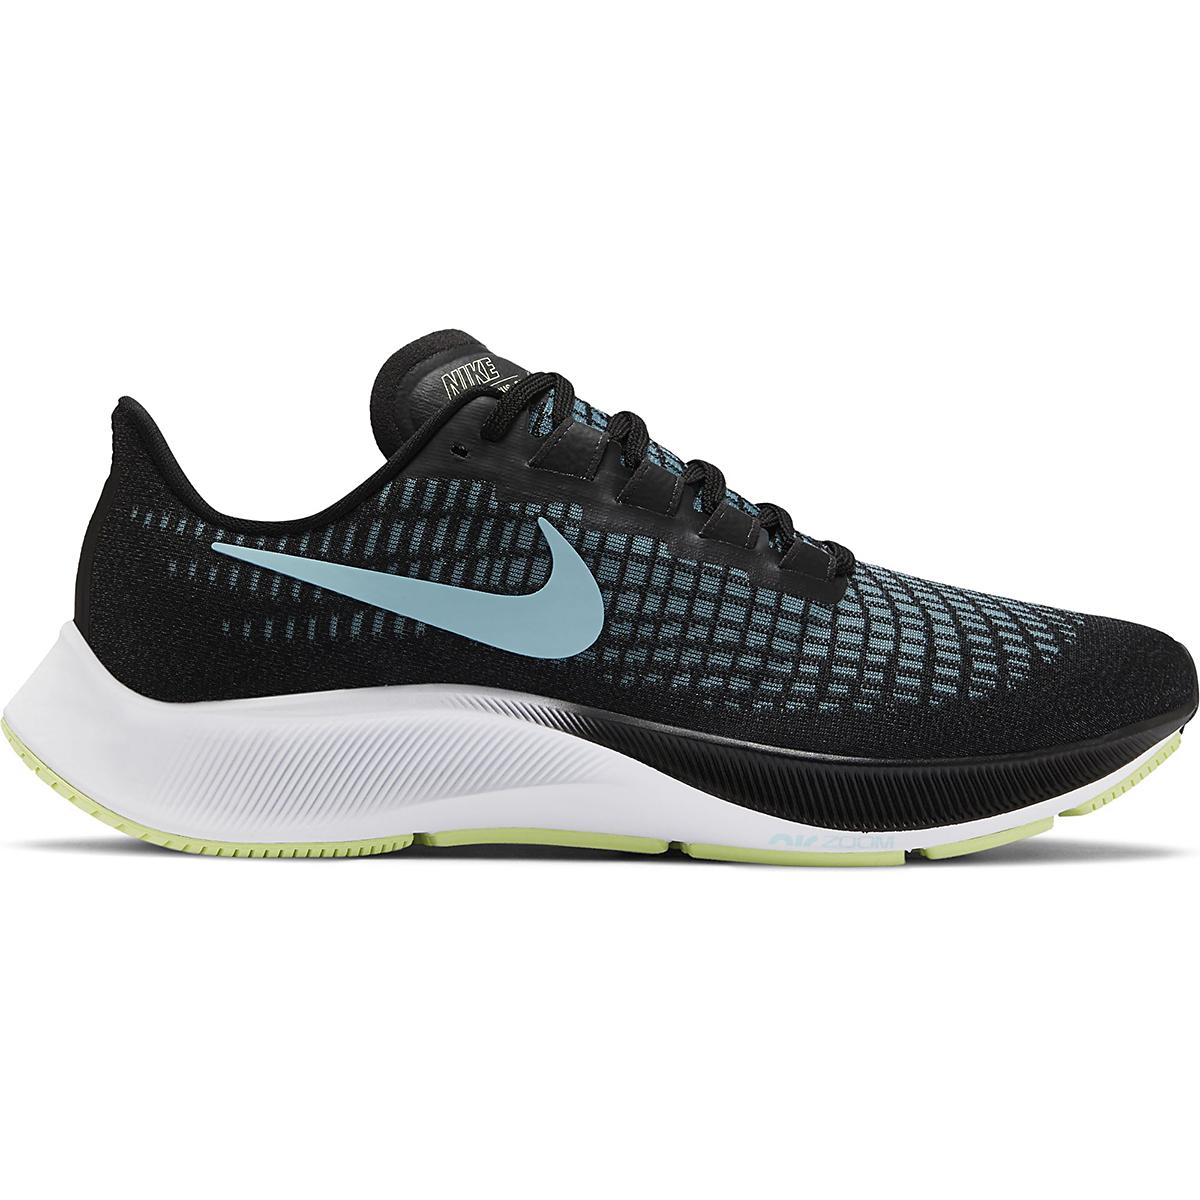 Women's Nike Air Zoom Pegasus 37 Running Shoe - Color: Black/Glacier Ice-Barely Volt-White - Size: 6 - Width: Regular, Black/Glacier Ice-Barely Volt-White, large, image 1